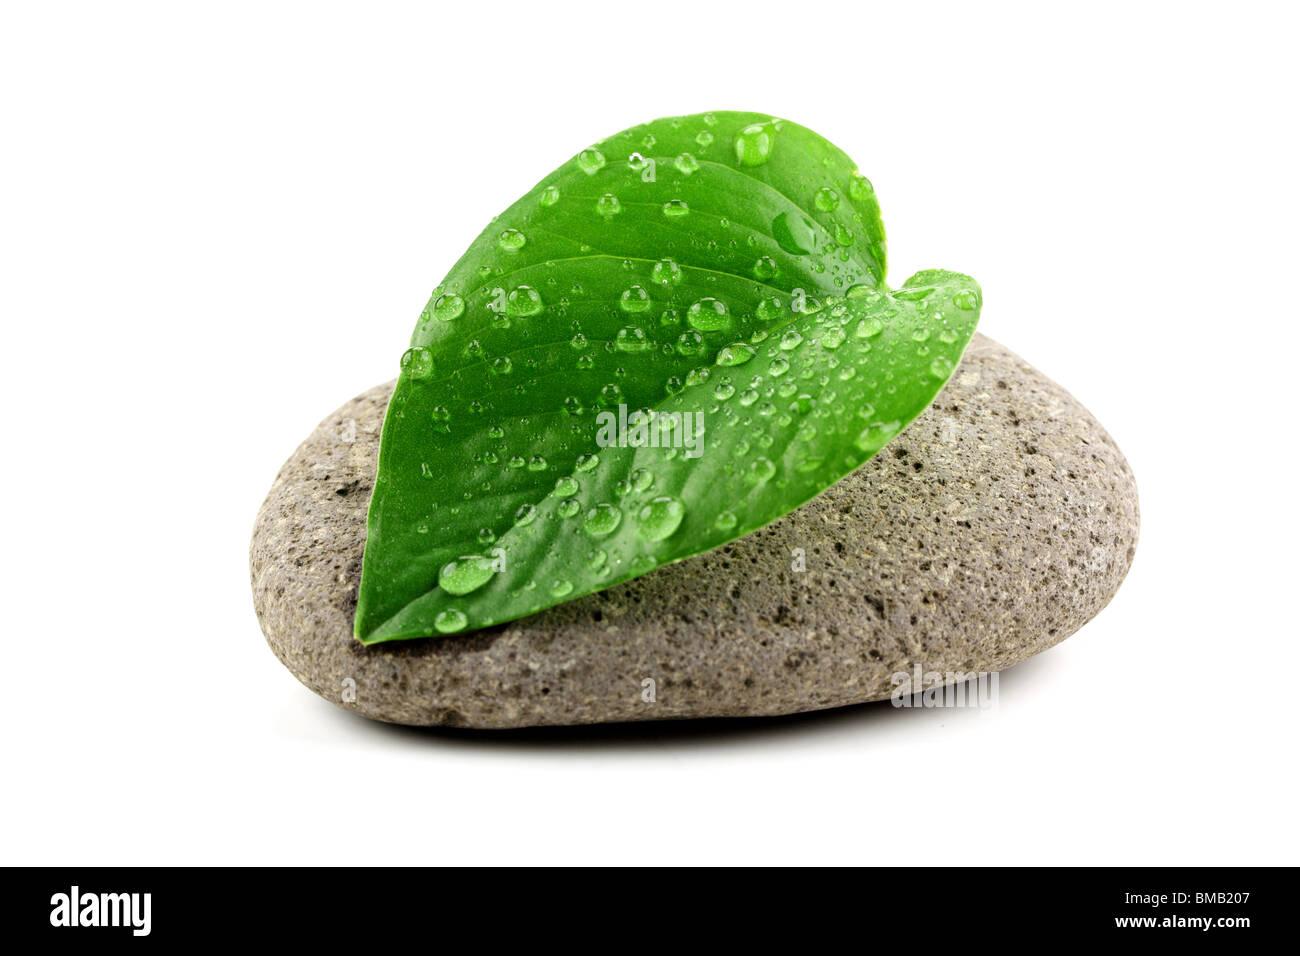 zen stone with leaf,isolated on white. - Stock Image